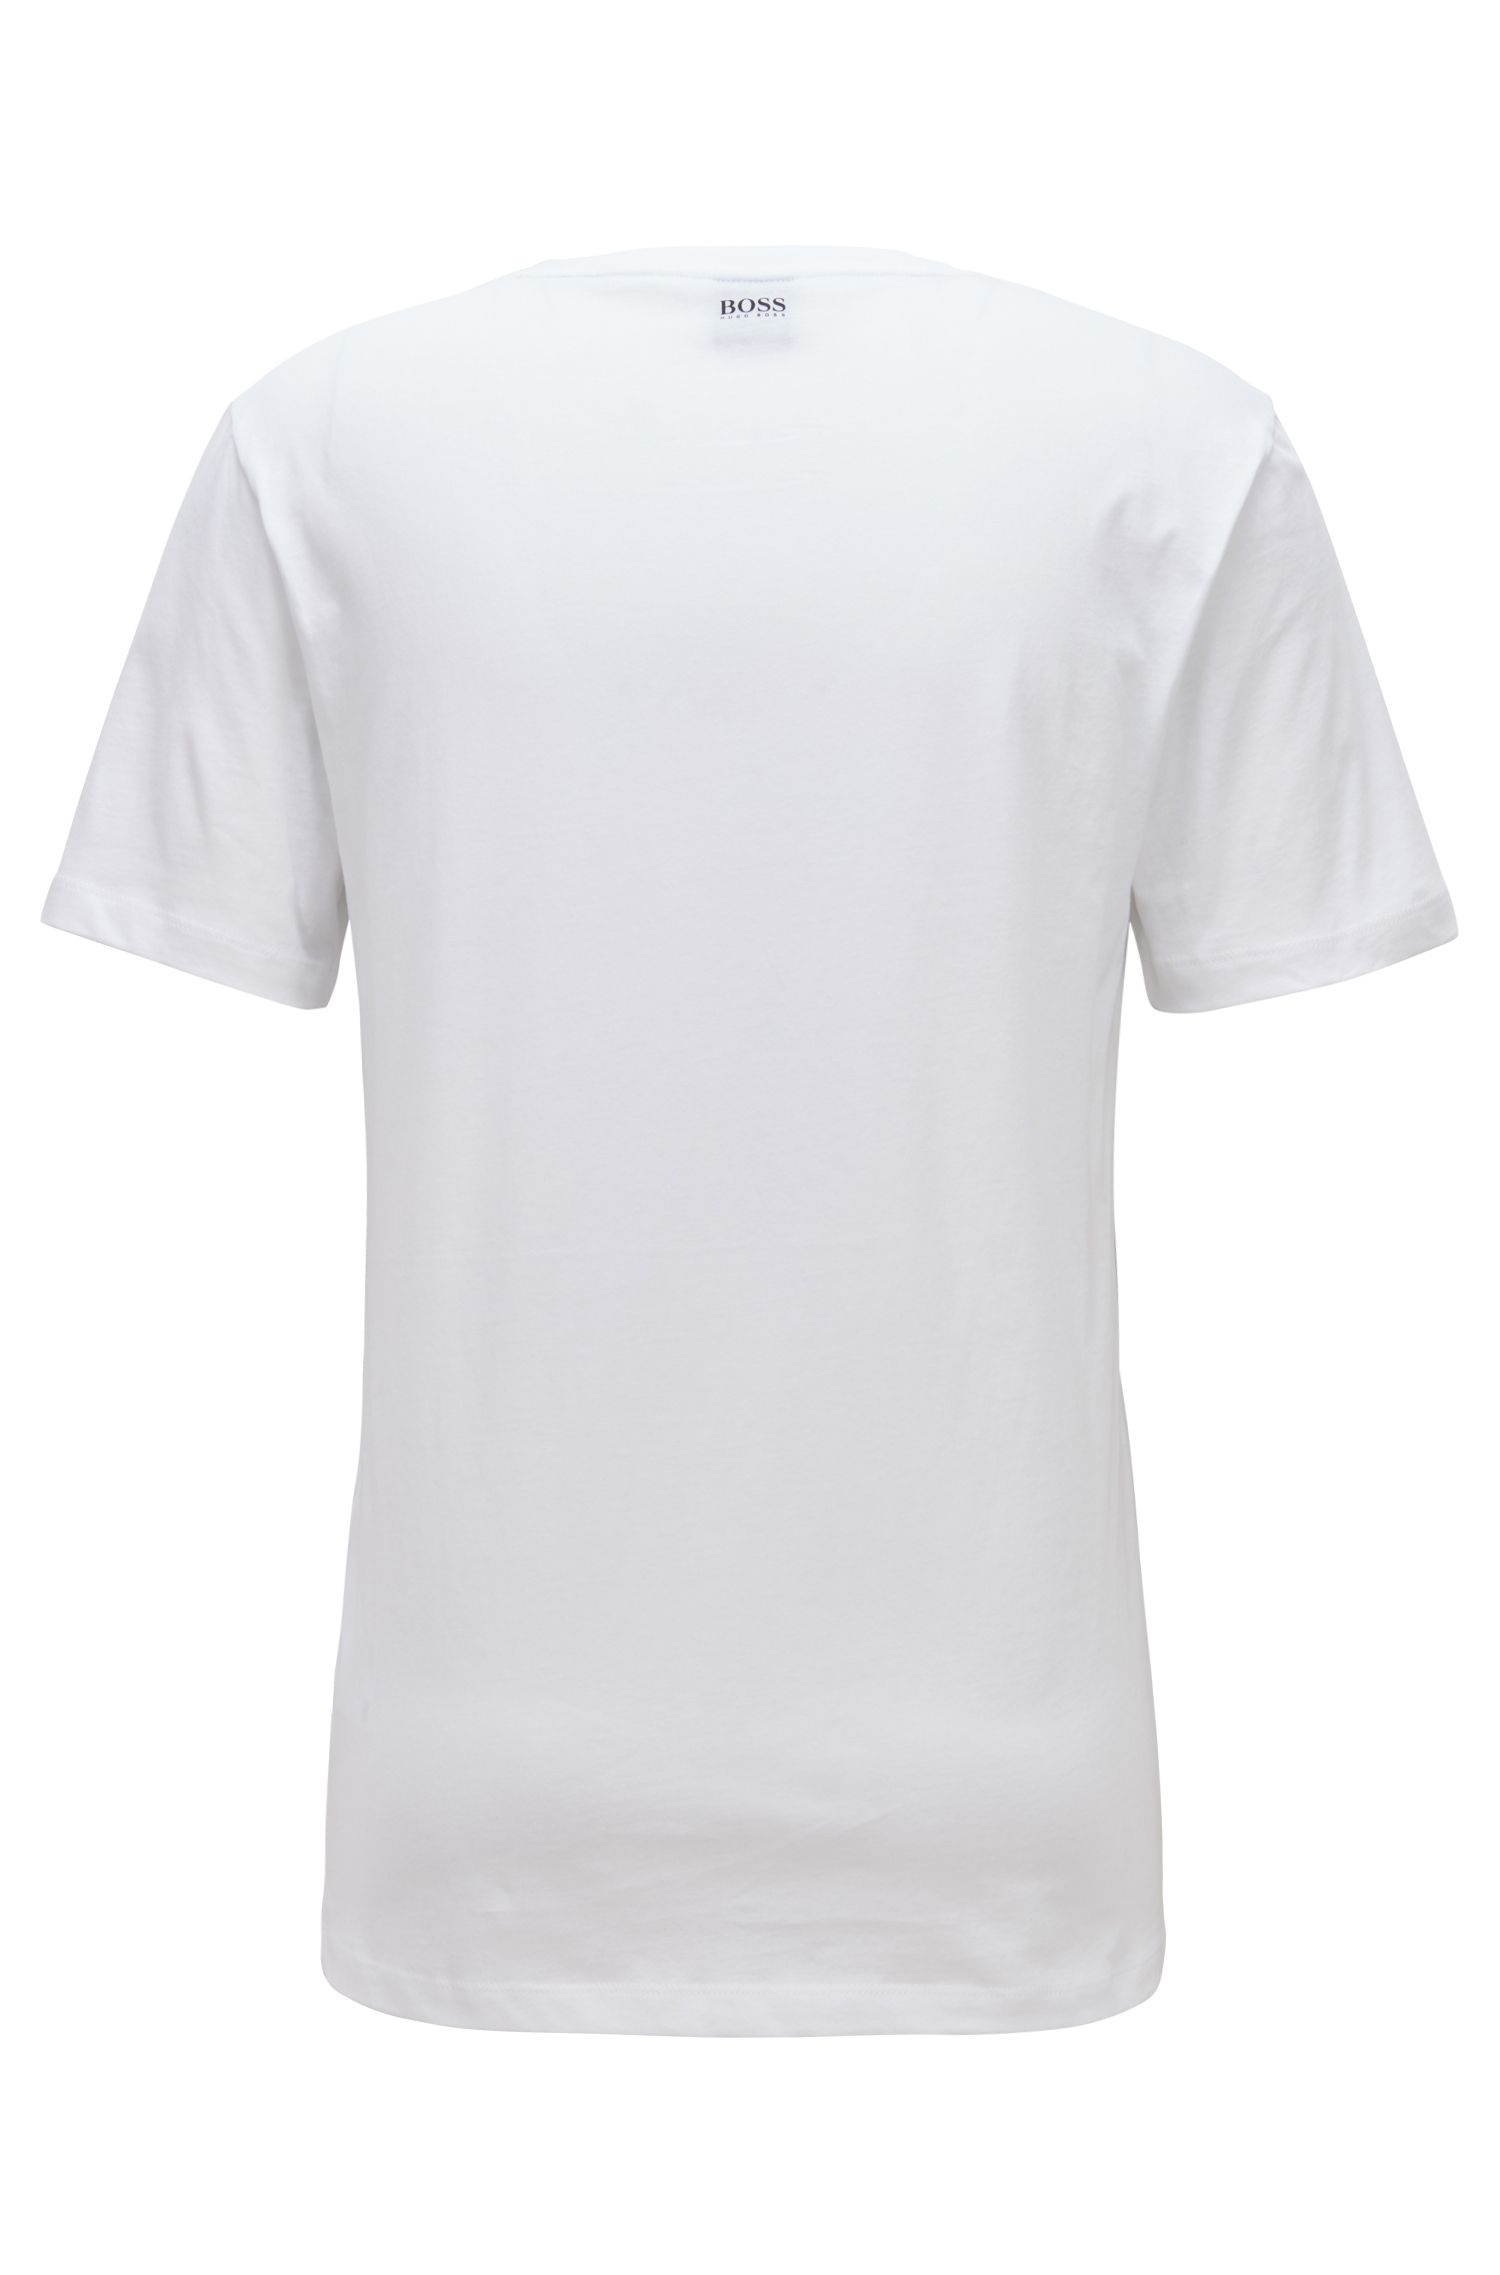 Camiseta de cuello redondo con estampado gráfico a base de agua, Blanco